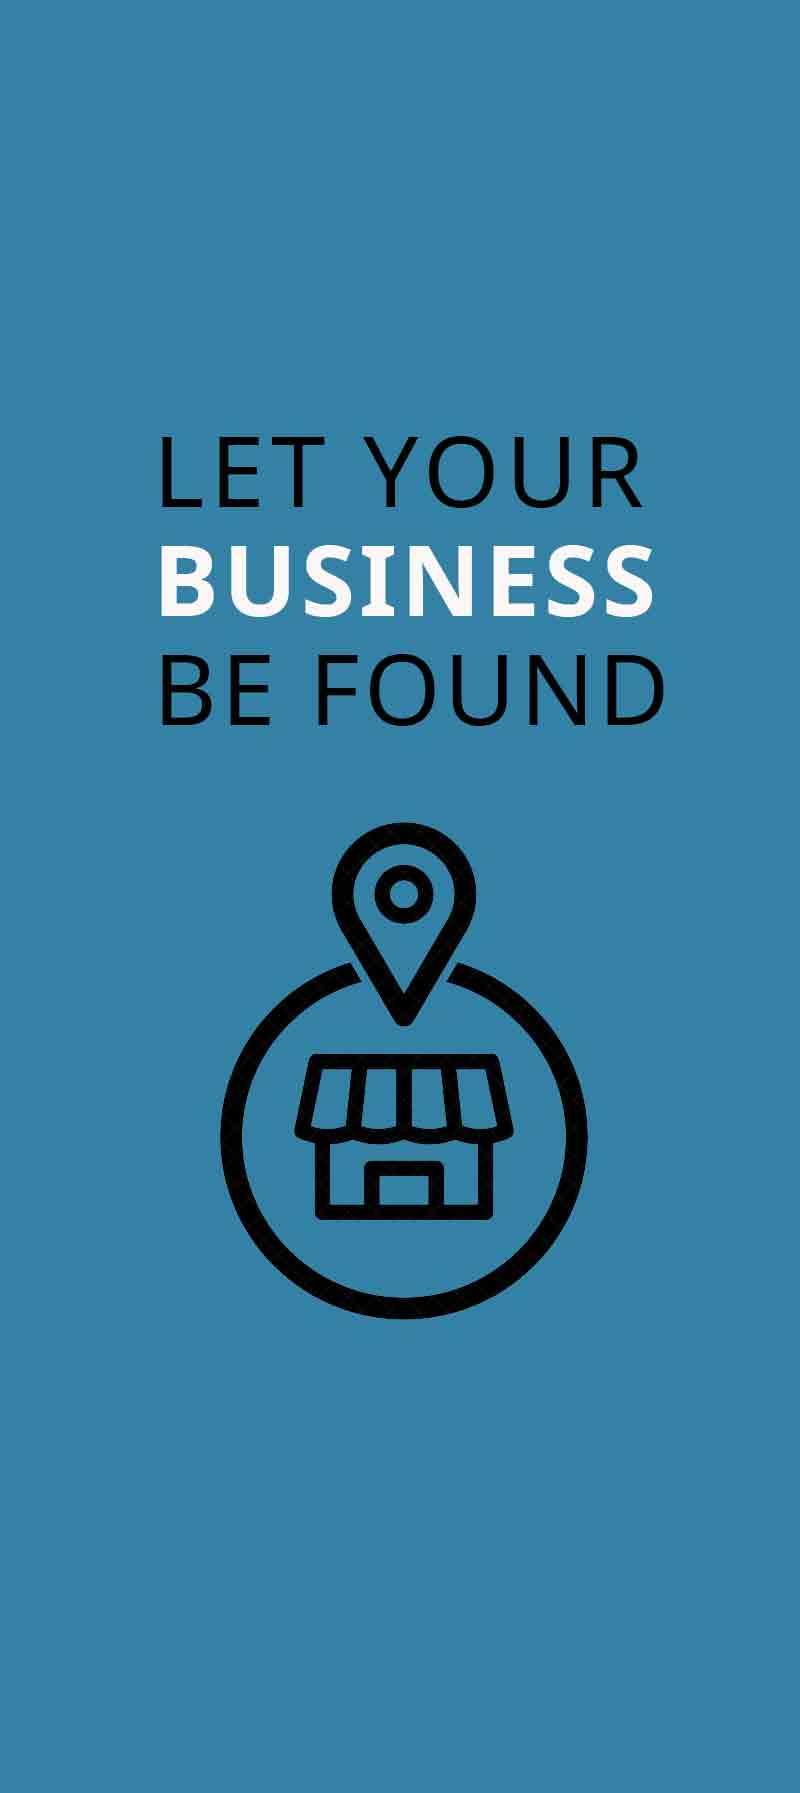 sri-lanka-small-business-found